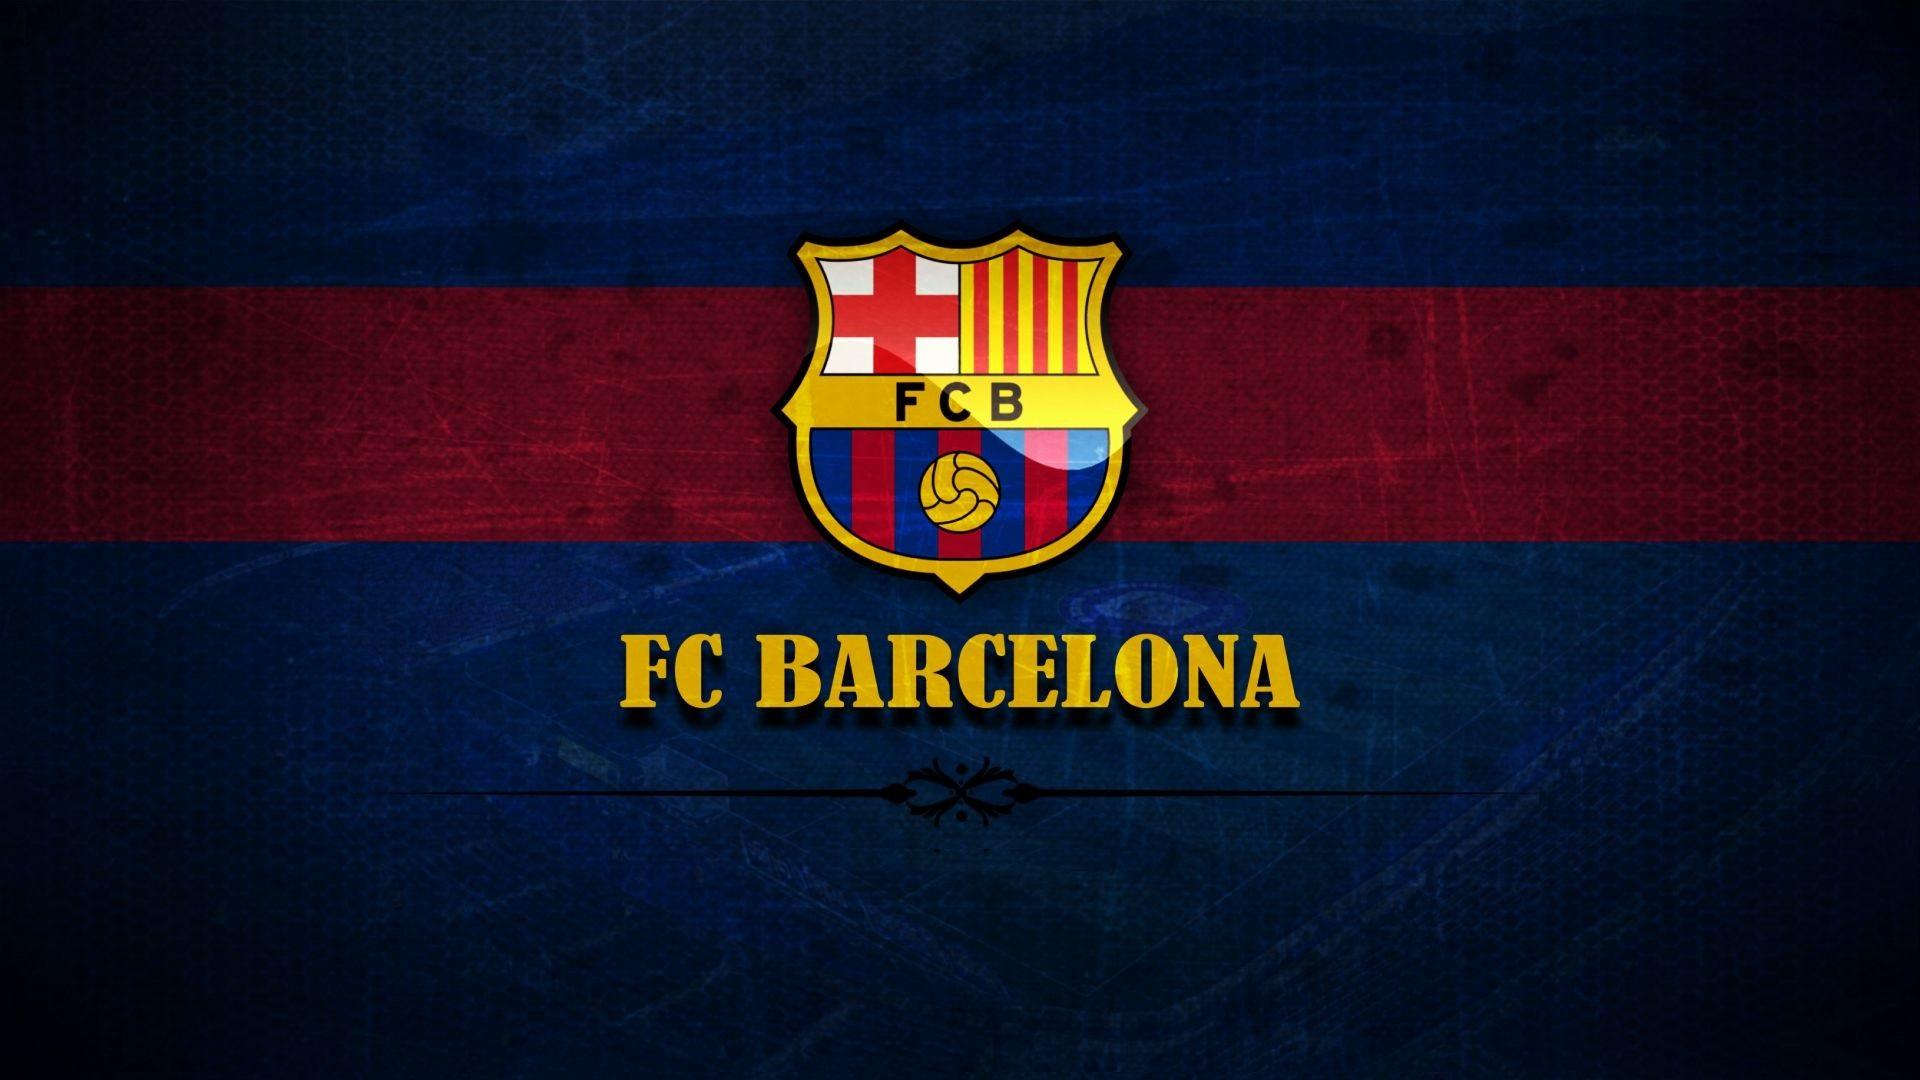 barcelona logo wallpaper hd 2021